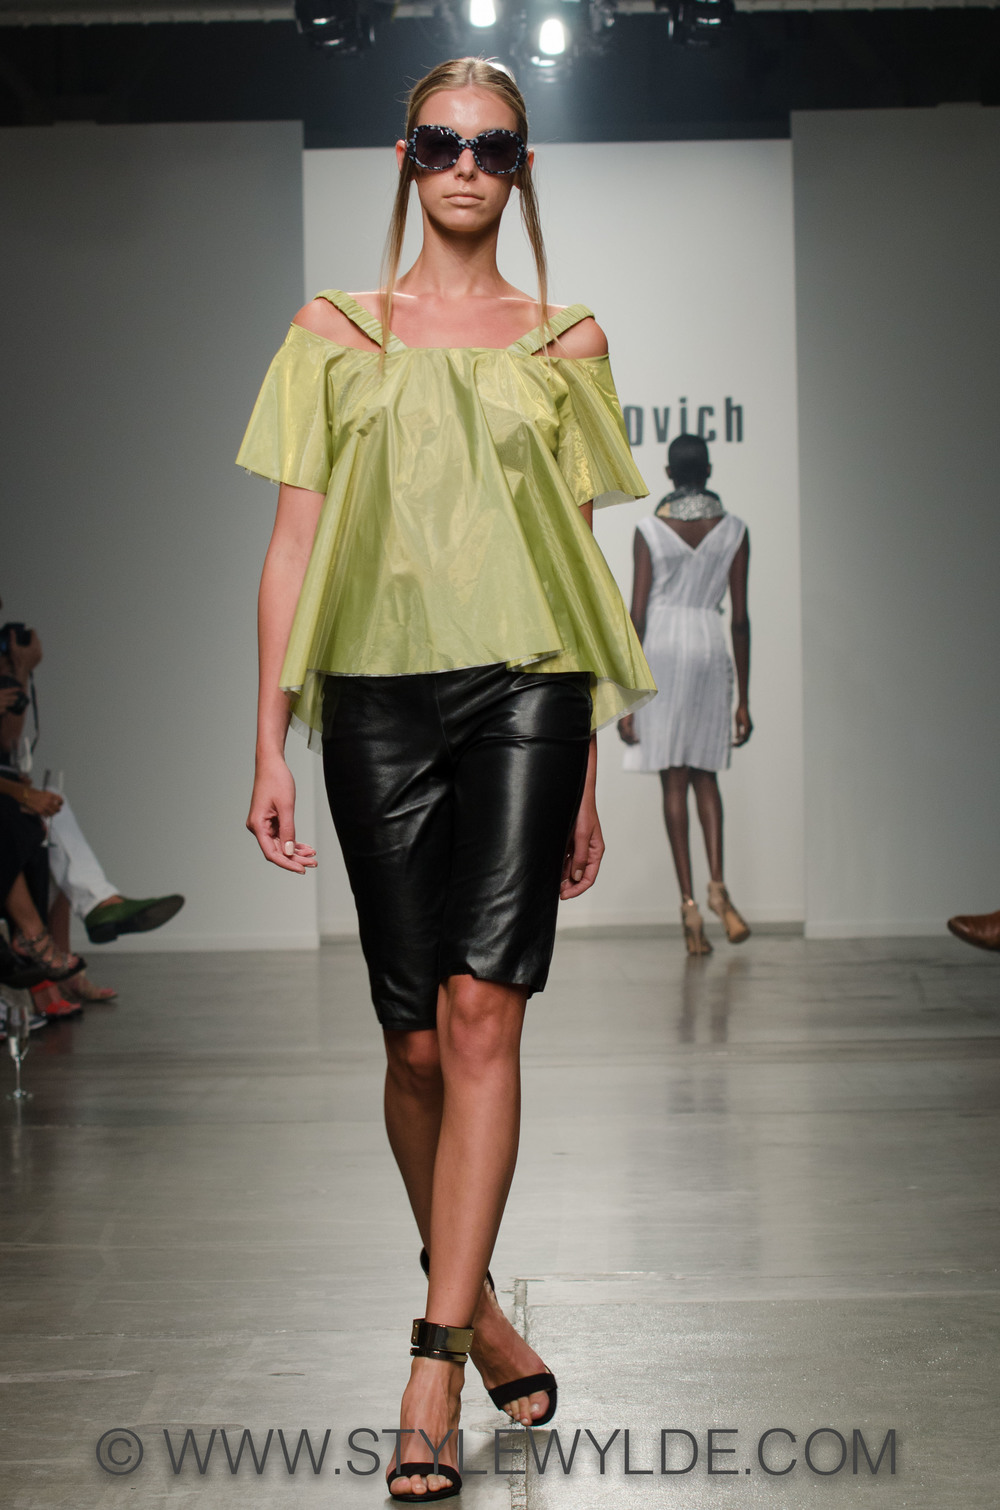 StyleWylde_KatyaSS15_FOH (9 of 28).jpg